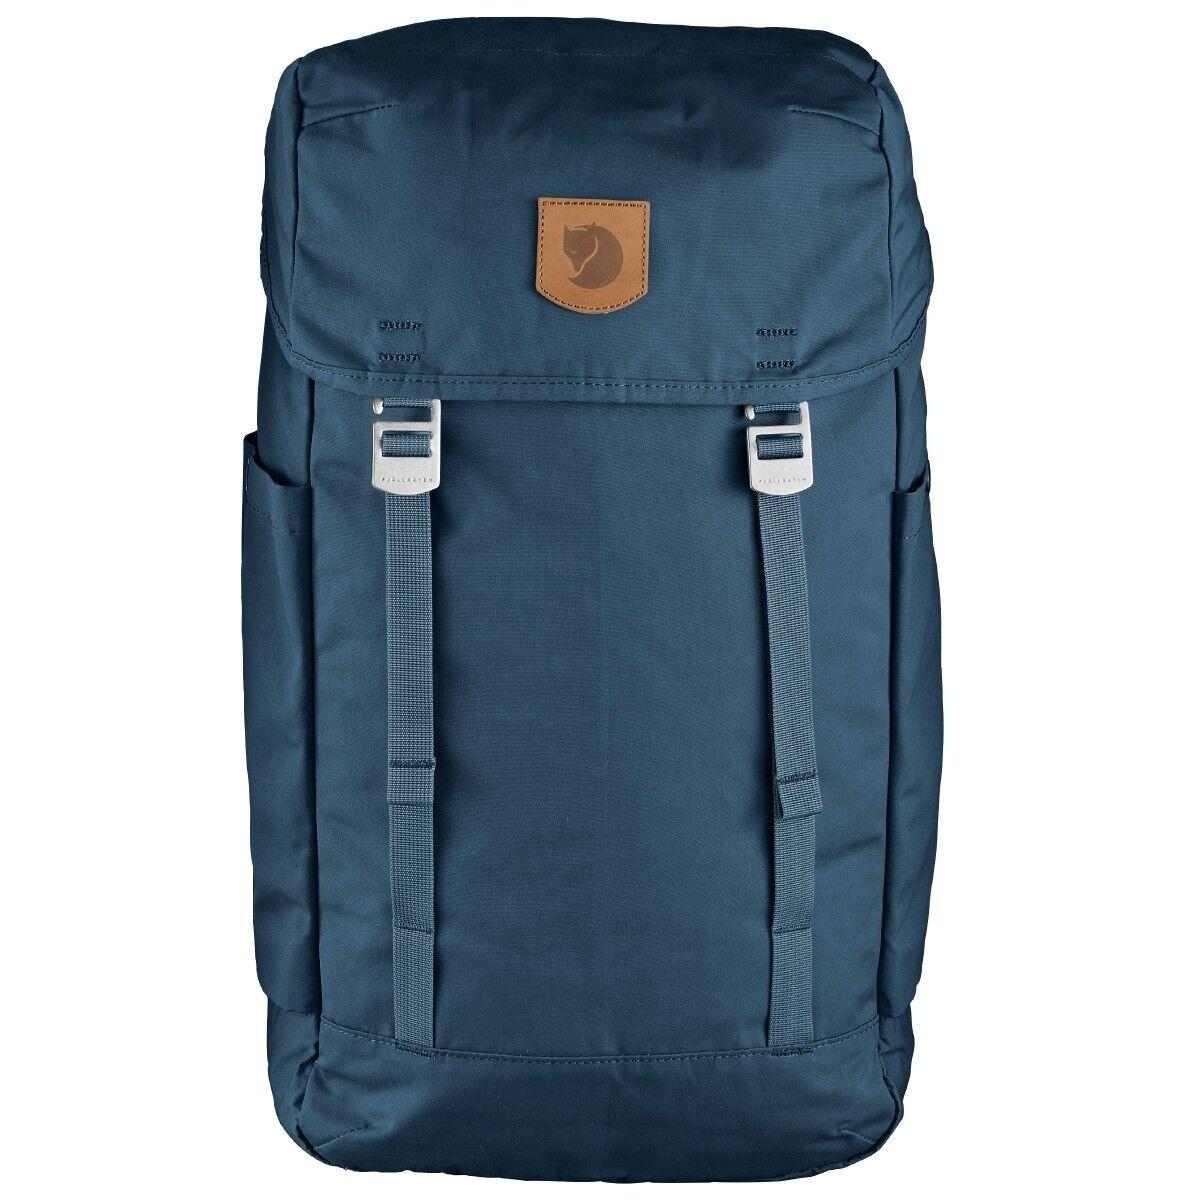 Fjällräven Grünland Top Rucksack Backpack Schule Laptop Tasche storm 23150-638